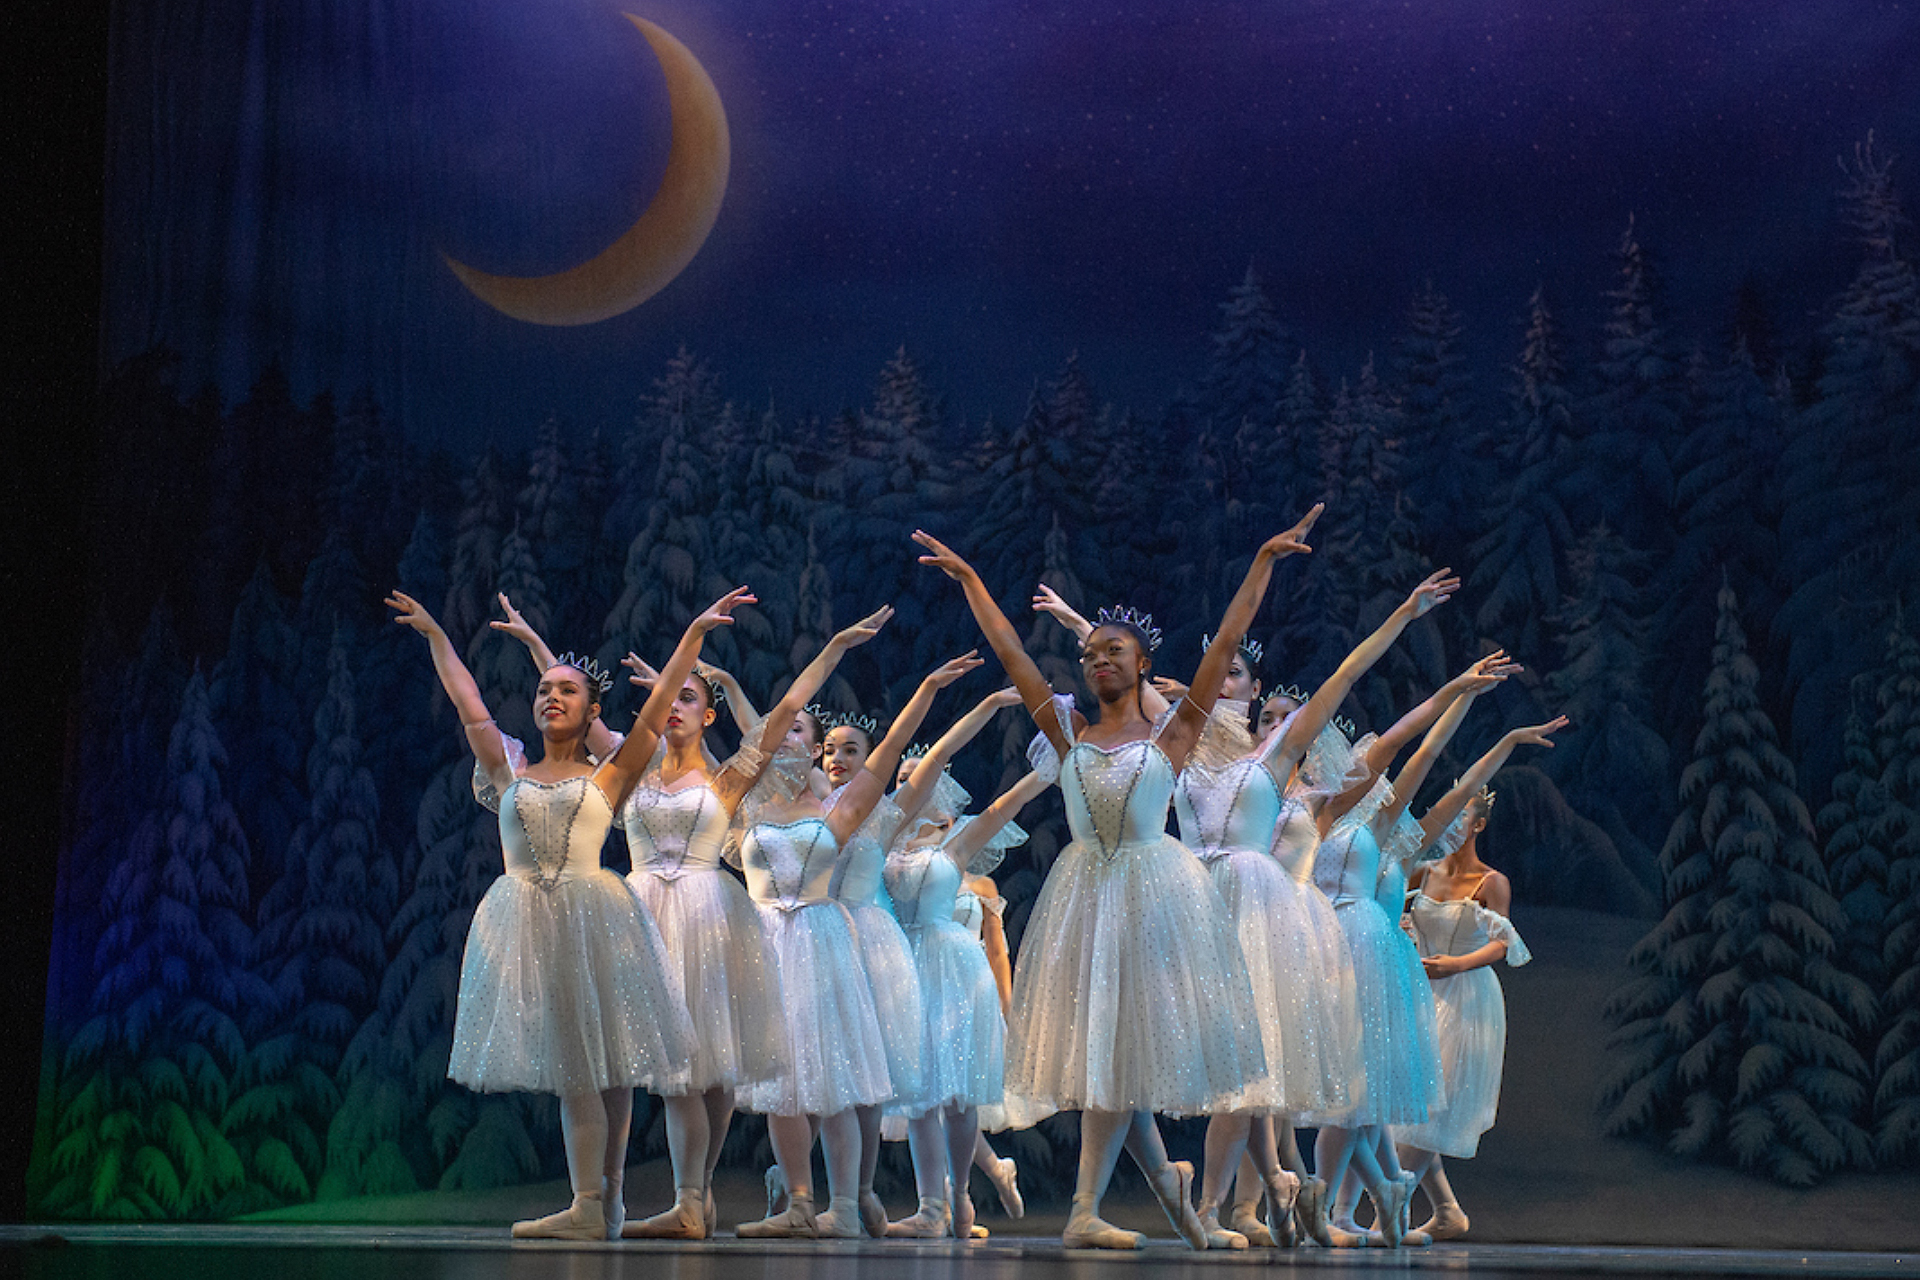 Thomas Armour Youth Ballet presents The Nutcracker